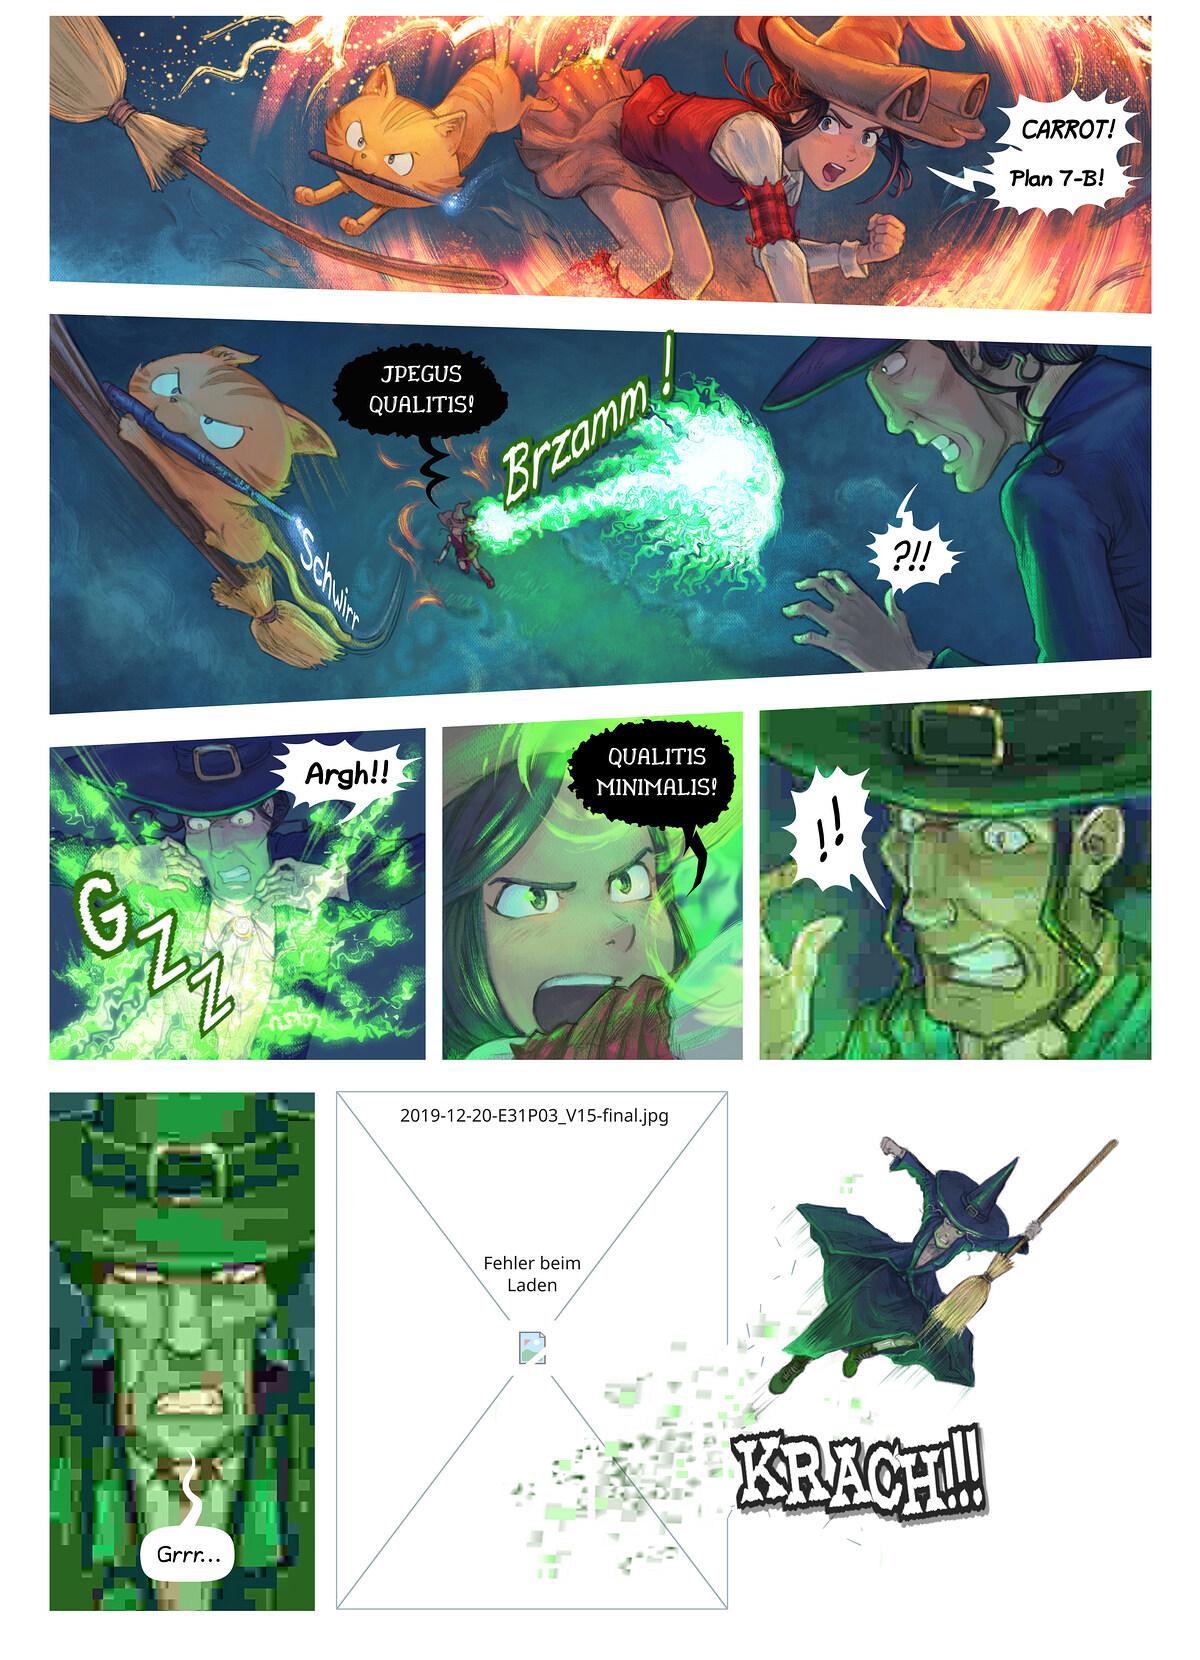 Episode 31: Der Kampf, Page 3